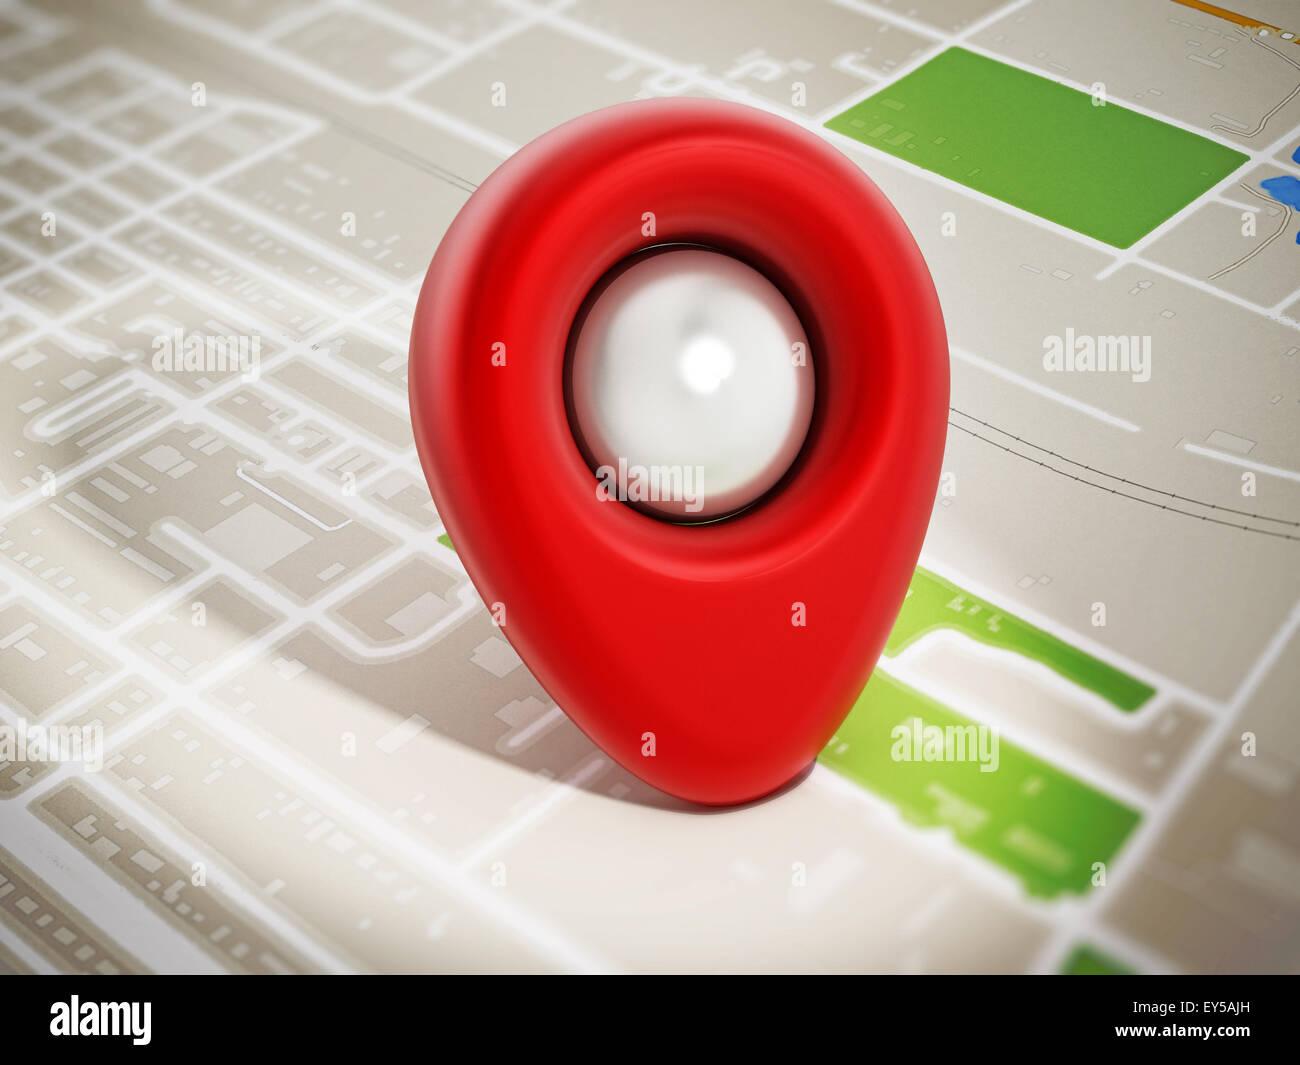 Red marker on navigation map. - Stock Image